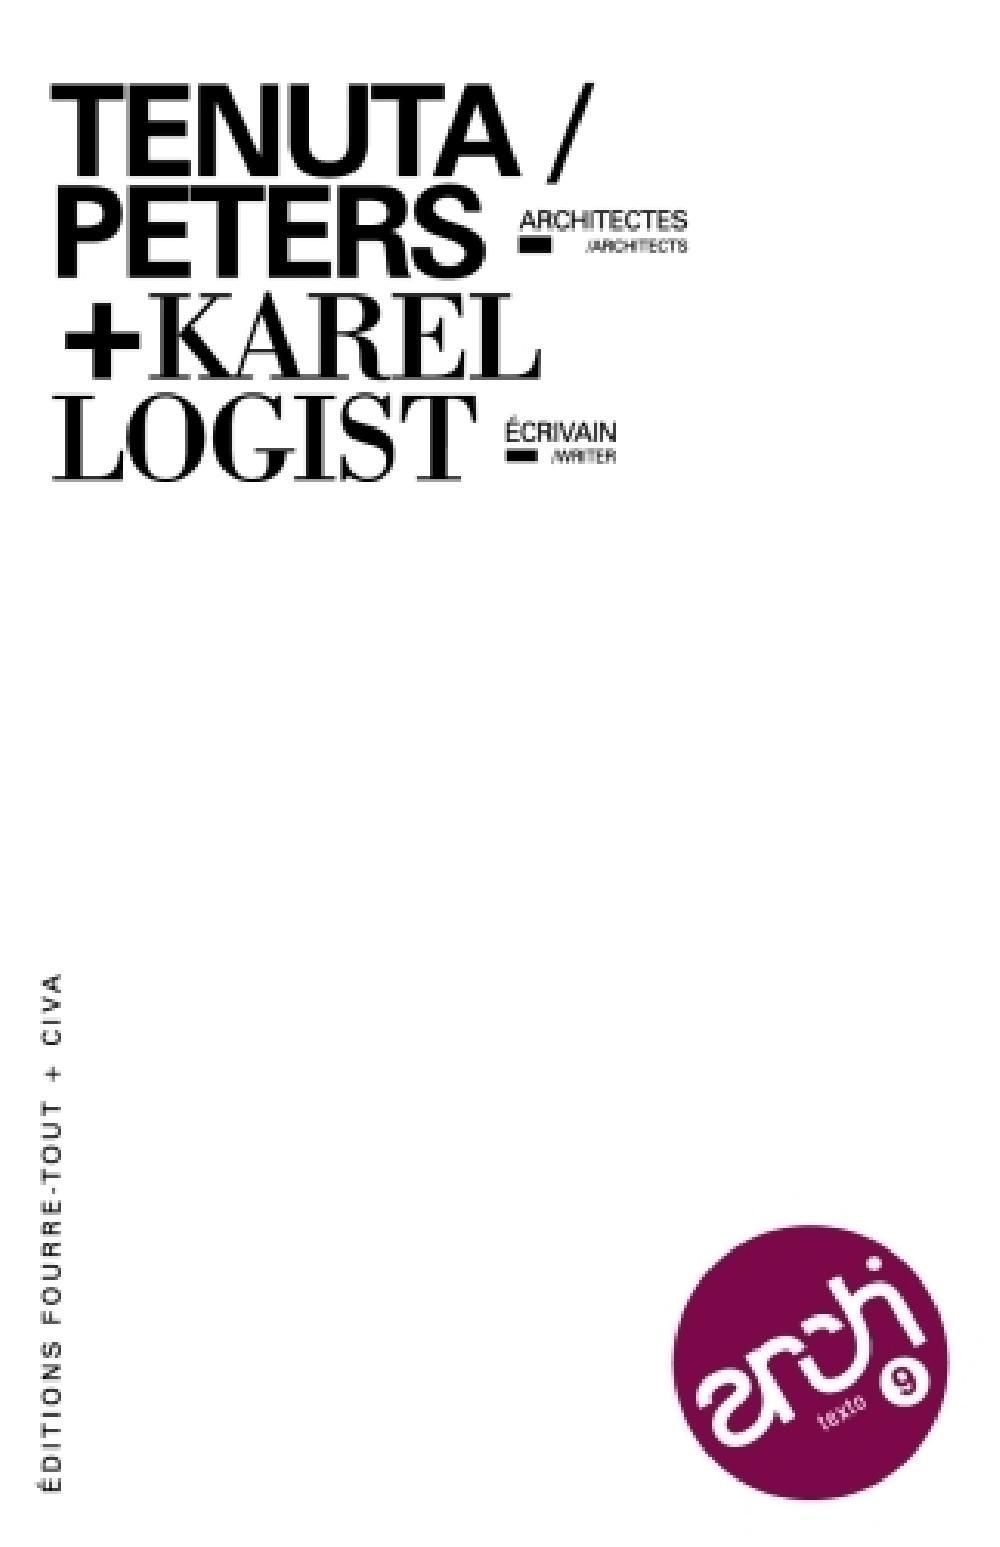 Tenuta Peters architectes + Karel Logist écrivain